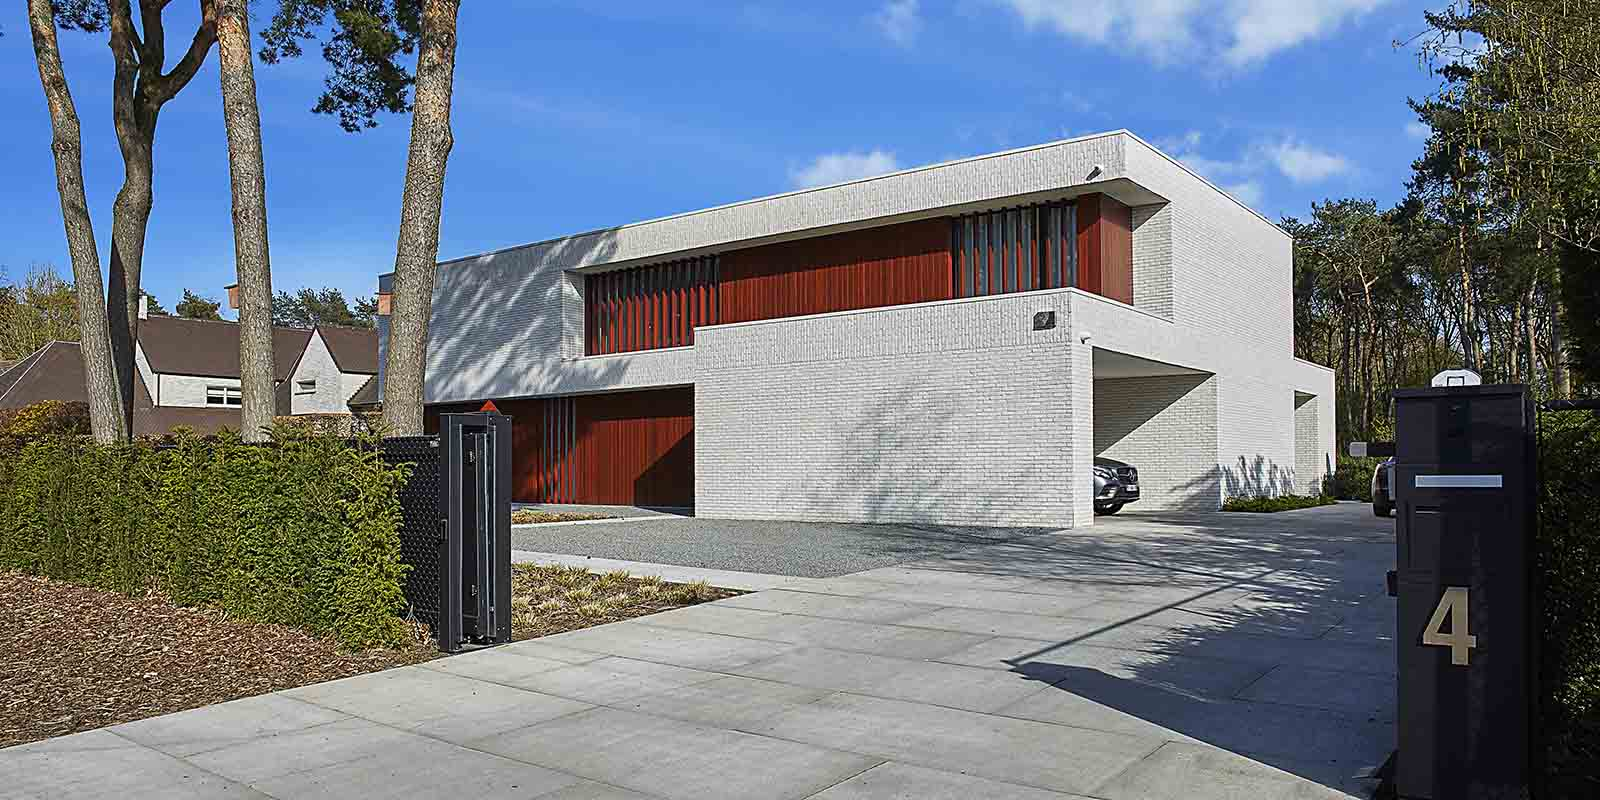 open interieur | Laurijssens Architects, the art of living